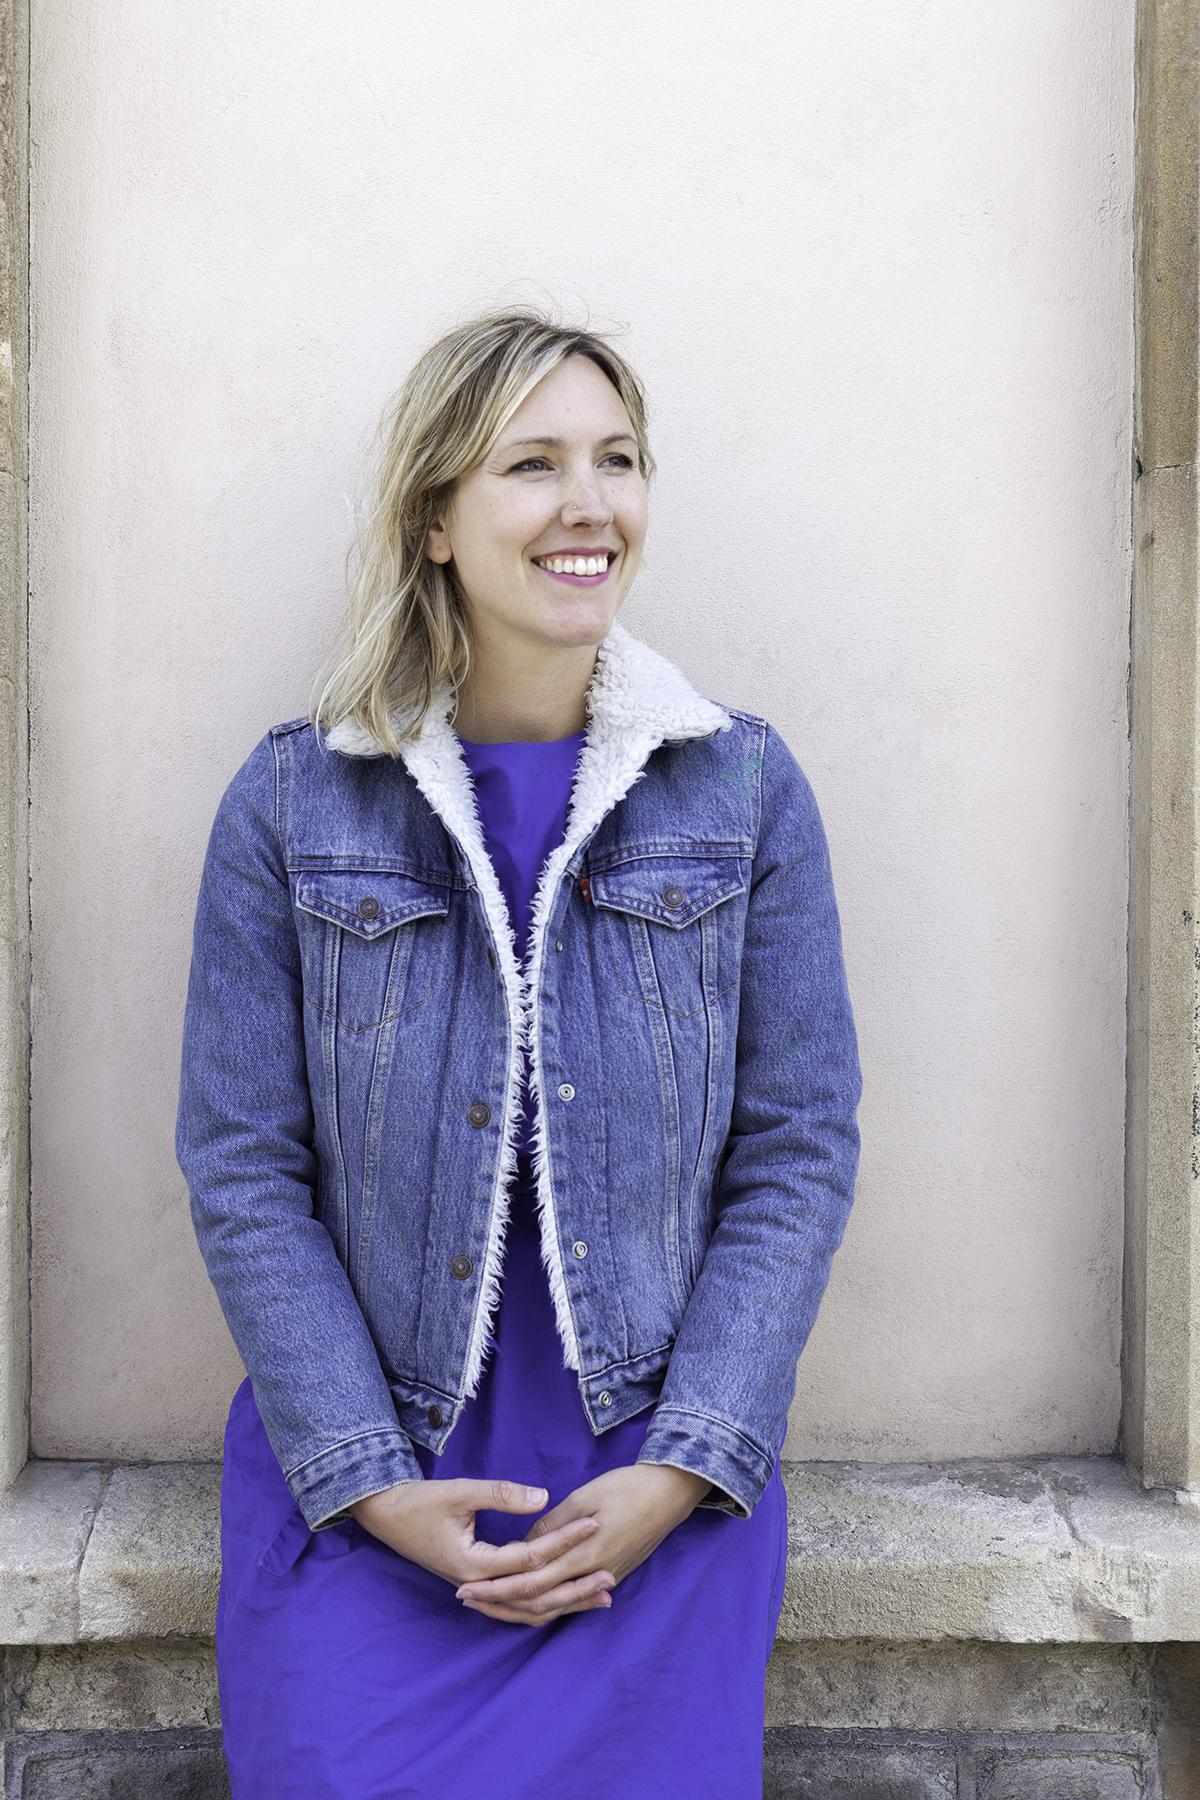 Founding editor Helen. Photo: Kasia Fiszer